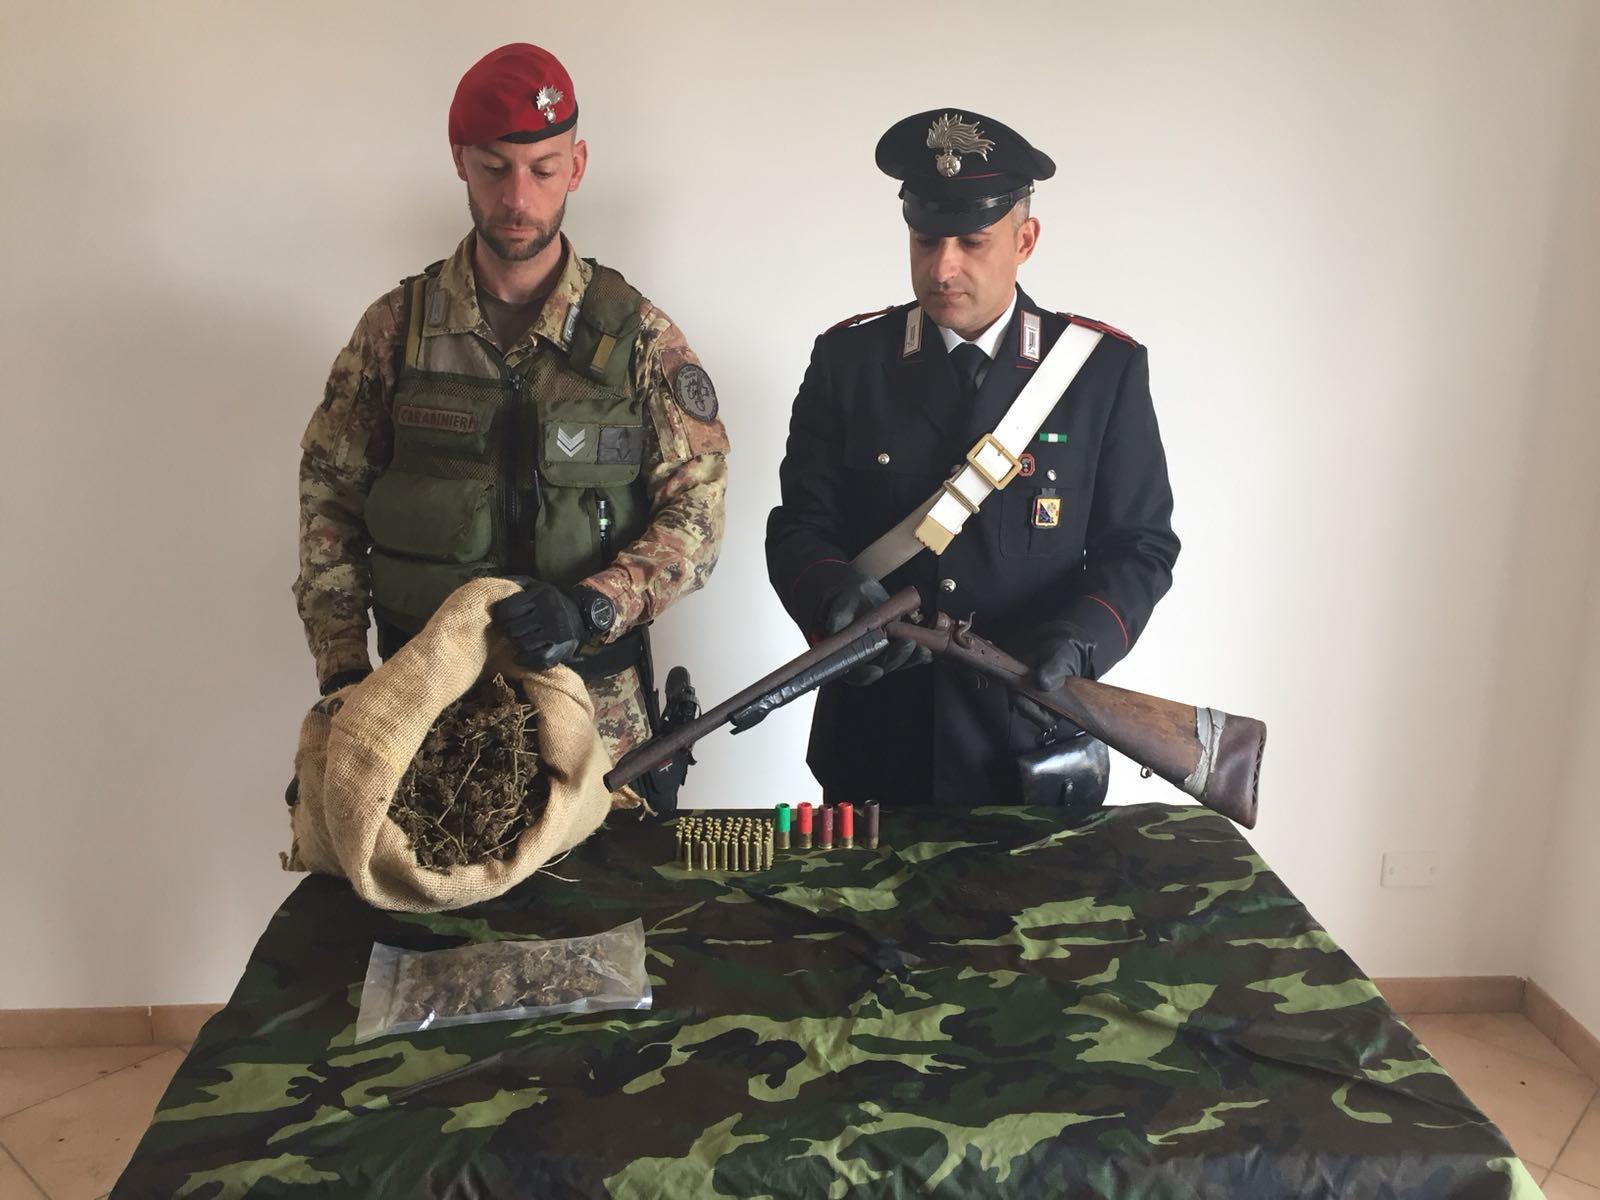 Fucile a canne mozze e il sacco di marijuana trovati a Ciminà